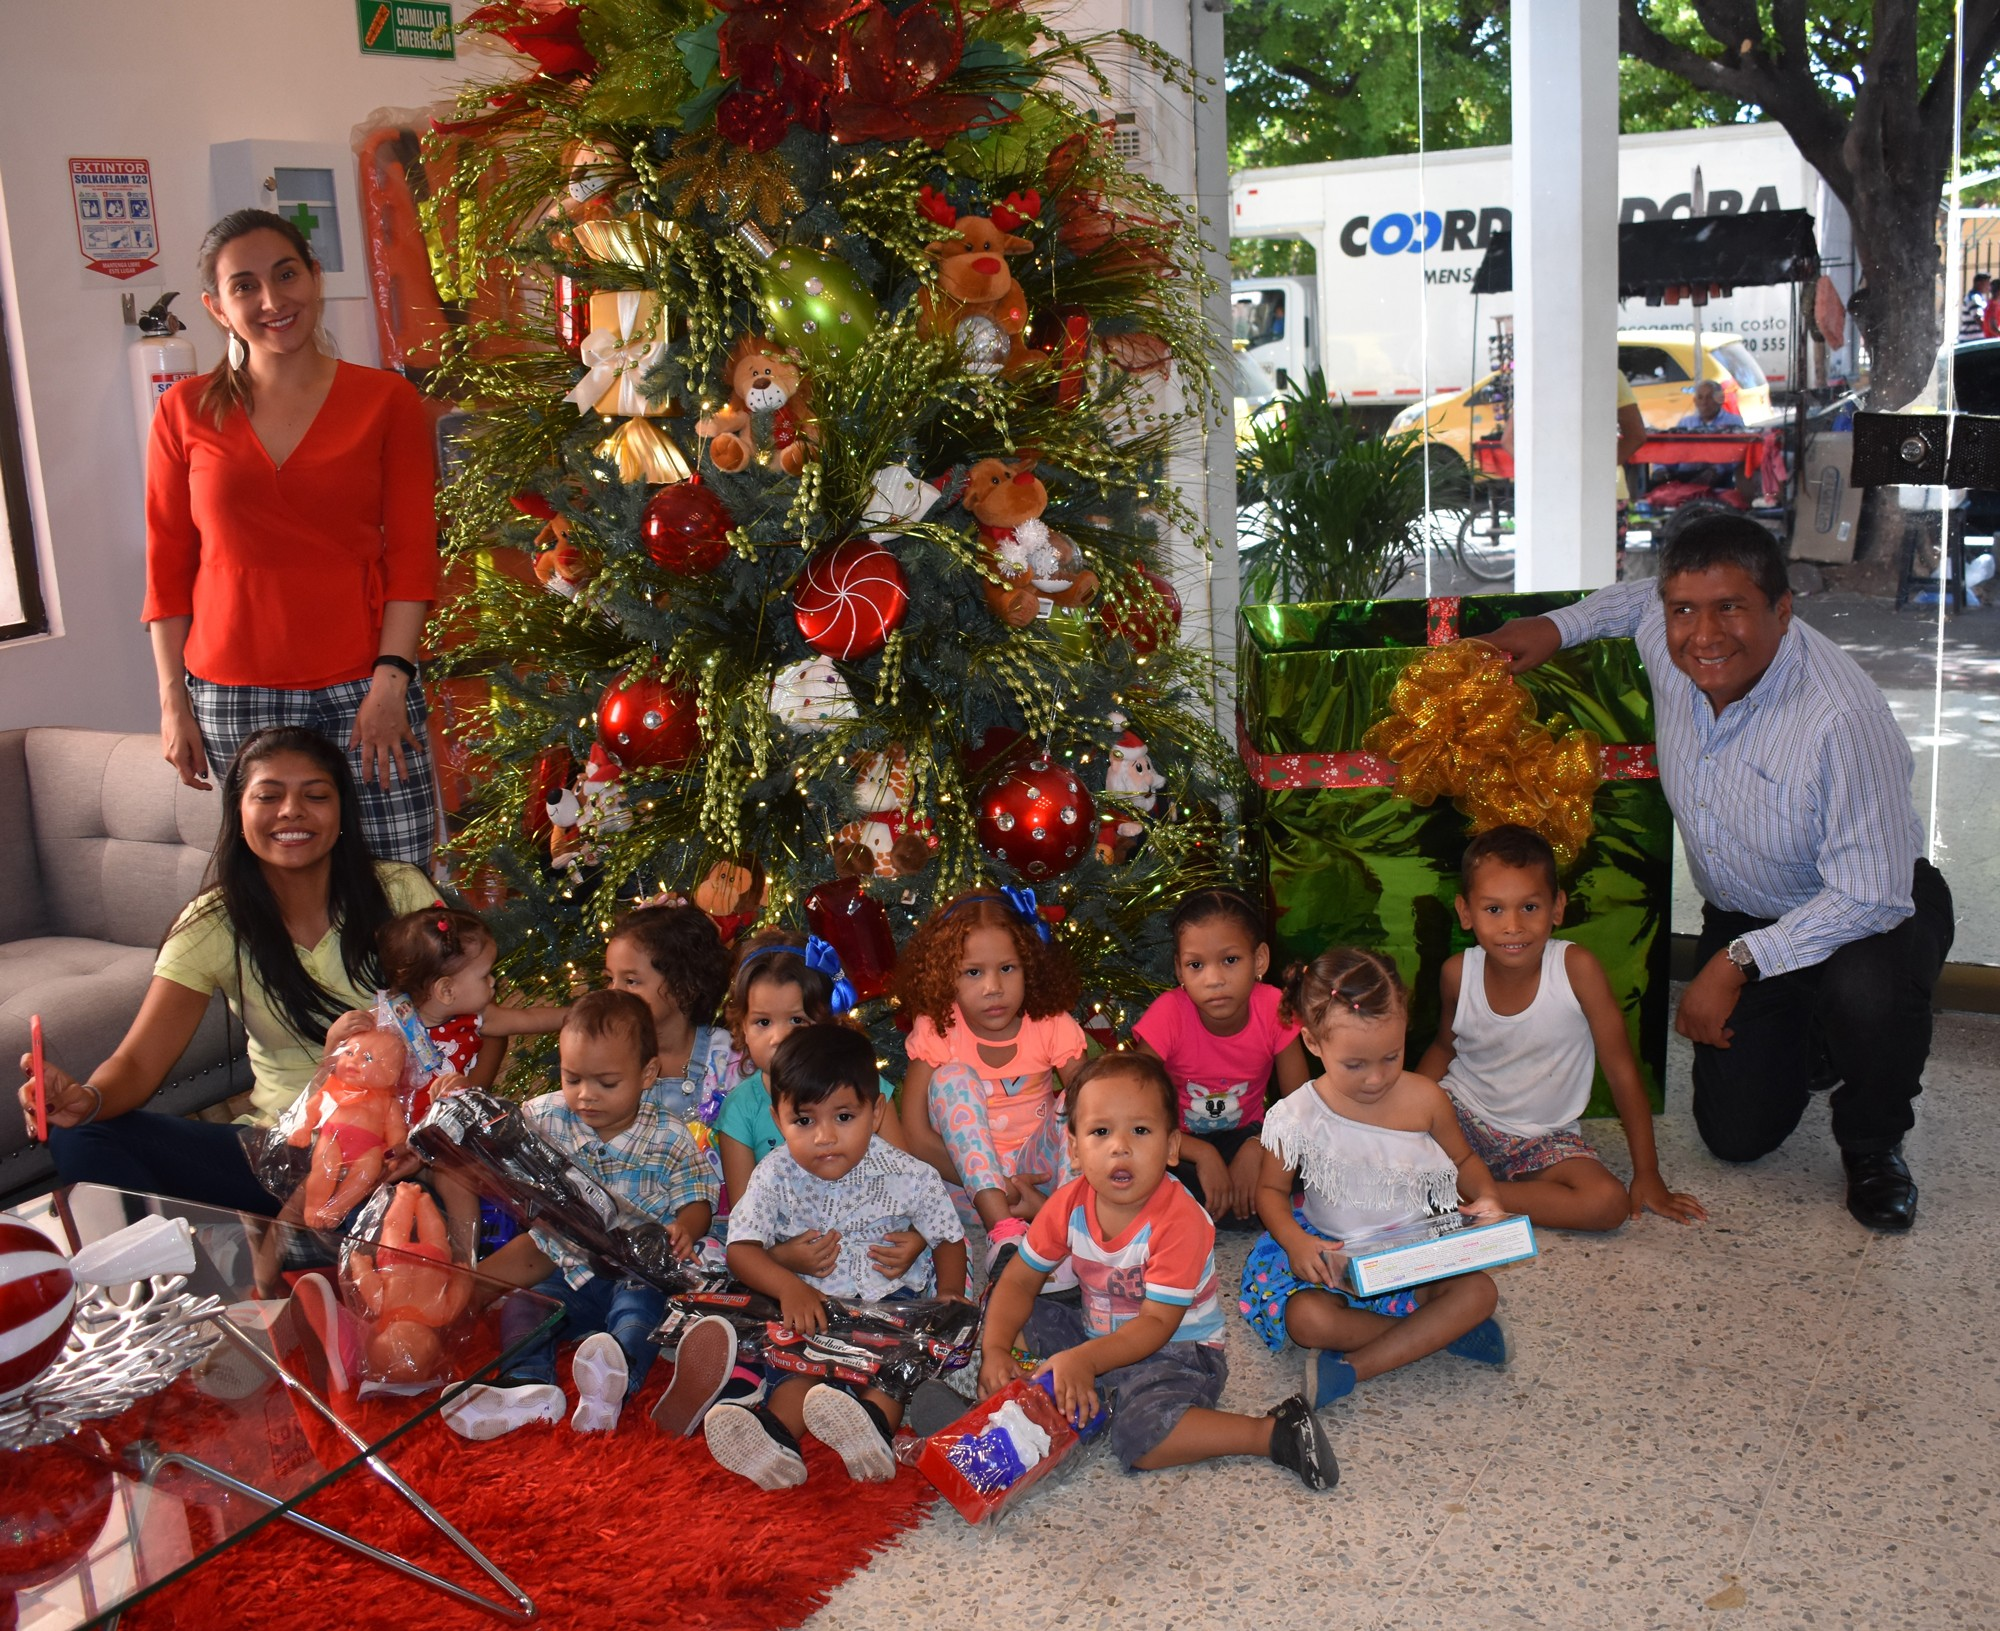 Donation program, Giving Smiles - Magazine La Calle, Valledupar.